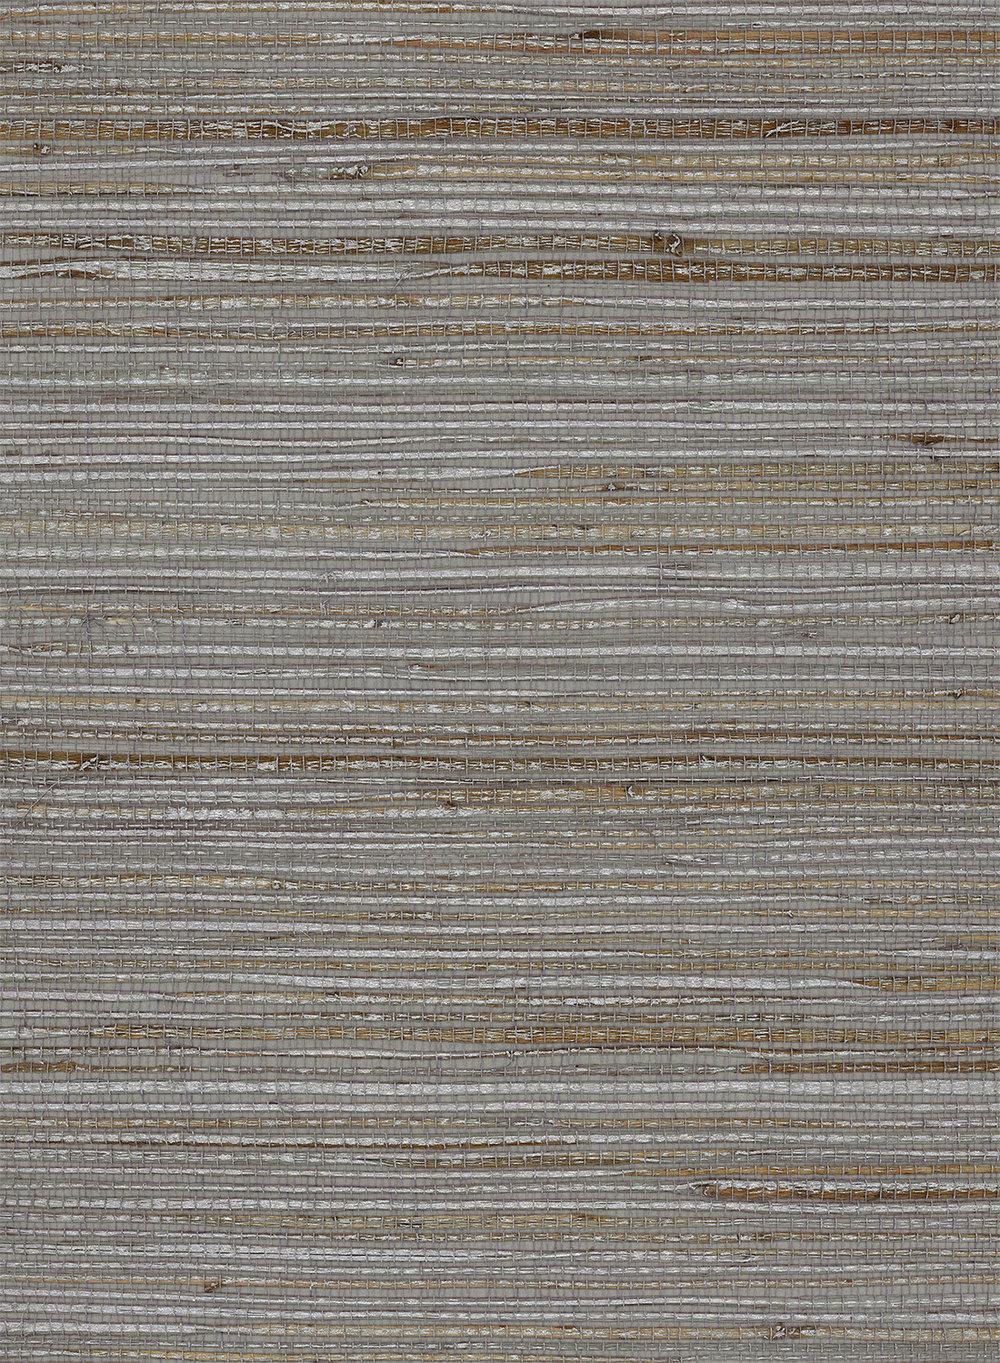 Jute Grasscloth - Hessite